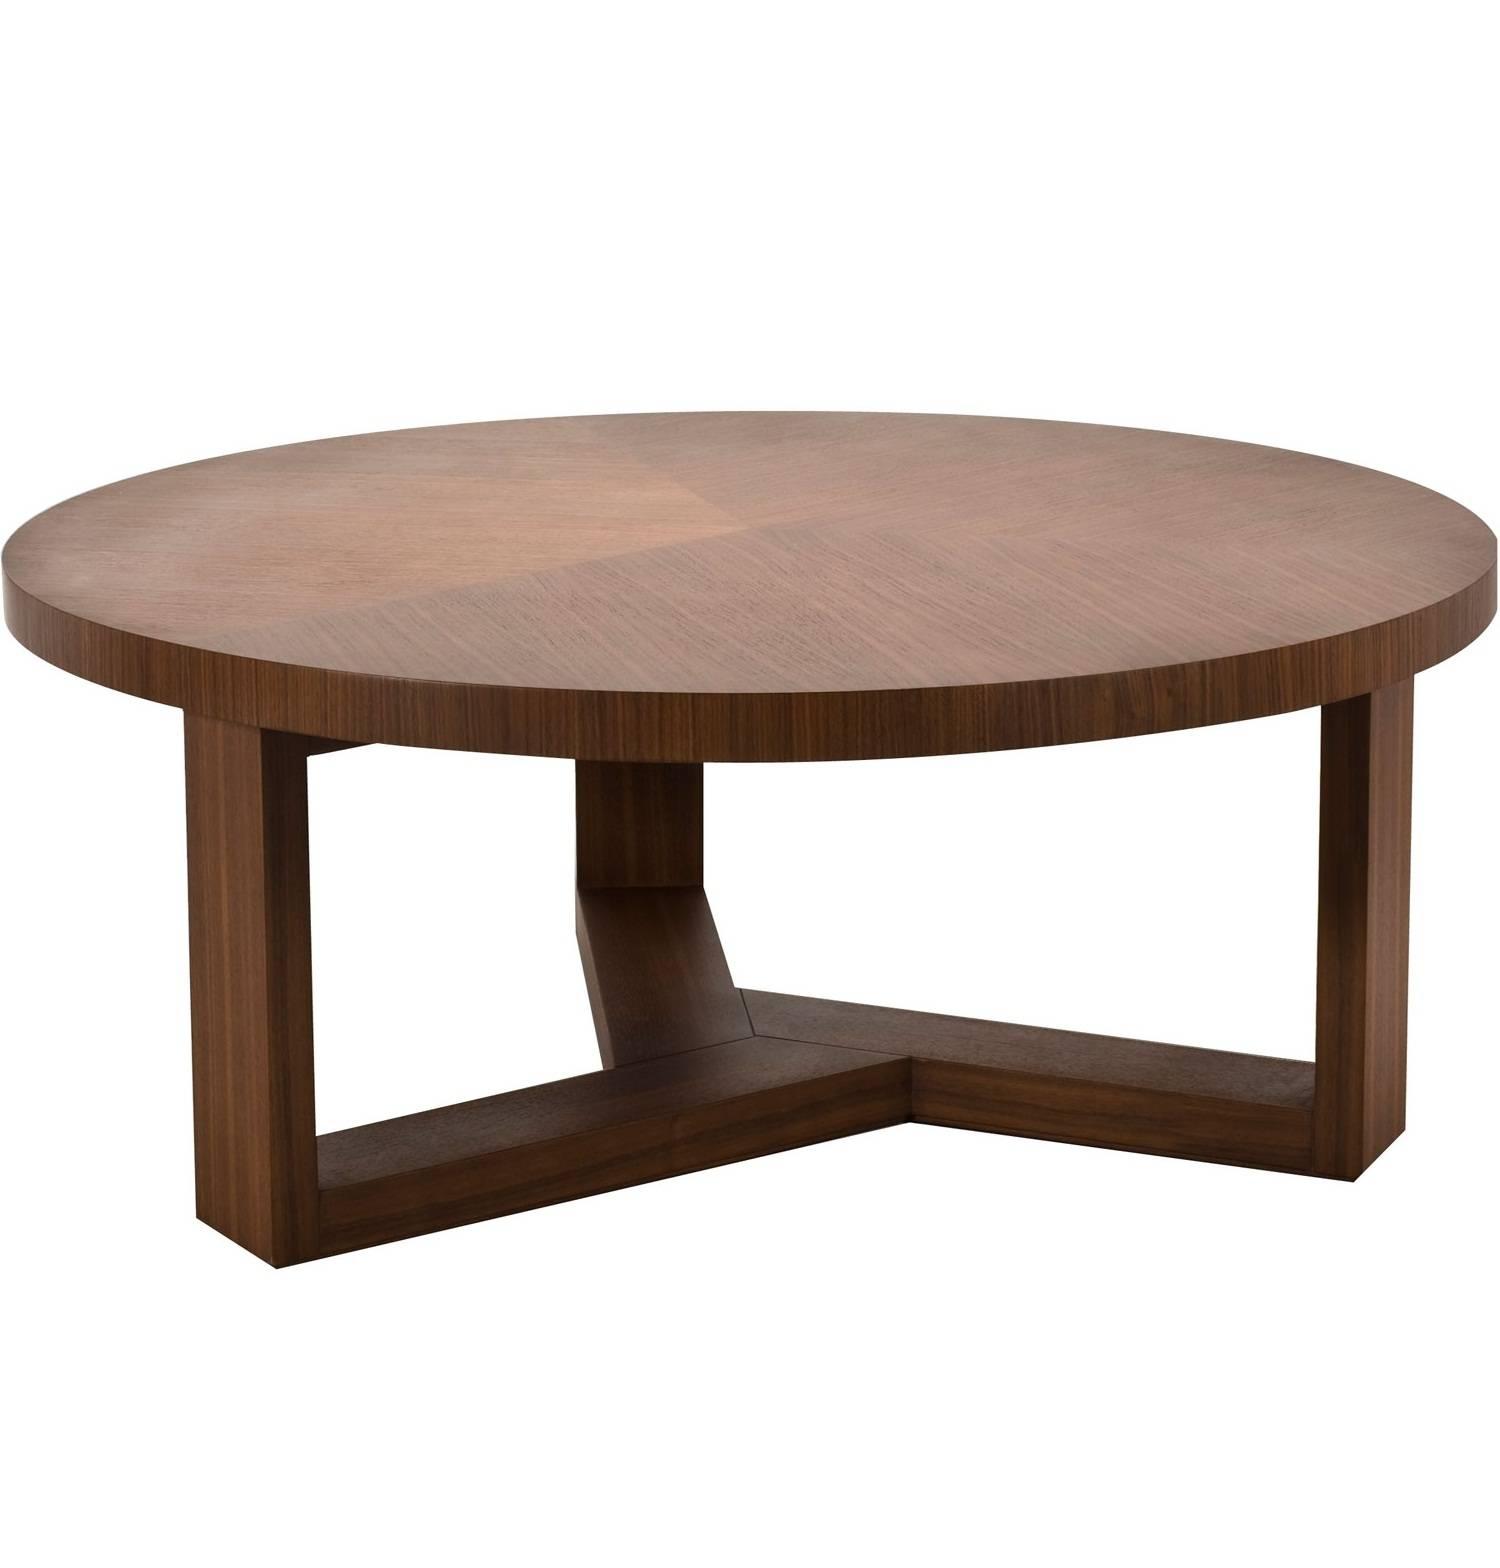 Coffee Table: Glamorous Contemporary Ottoman Coffee Table Best With Circular Coffee Tables (View 12 of 30)